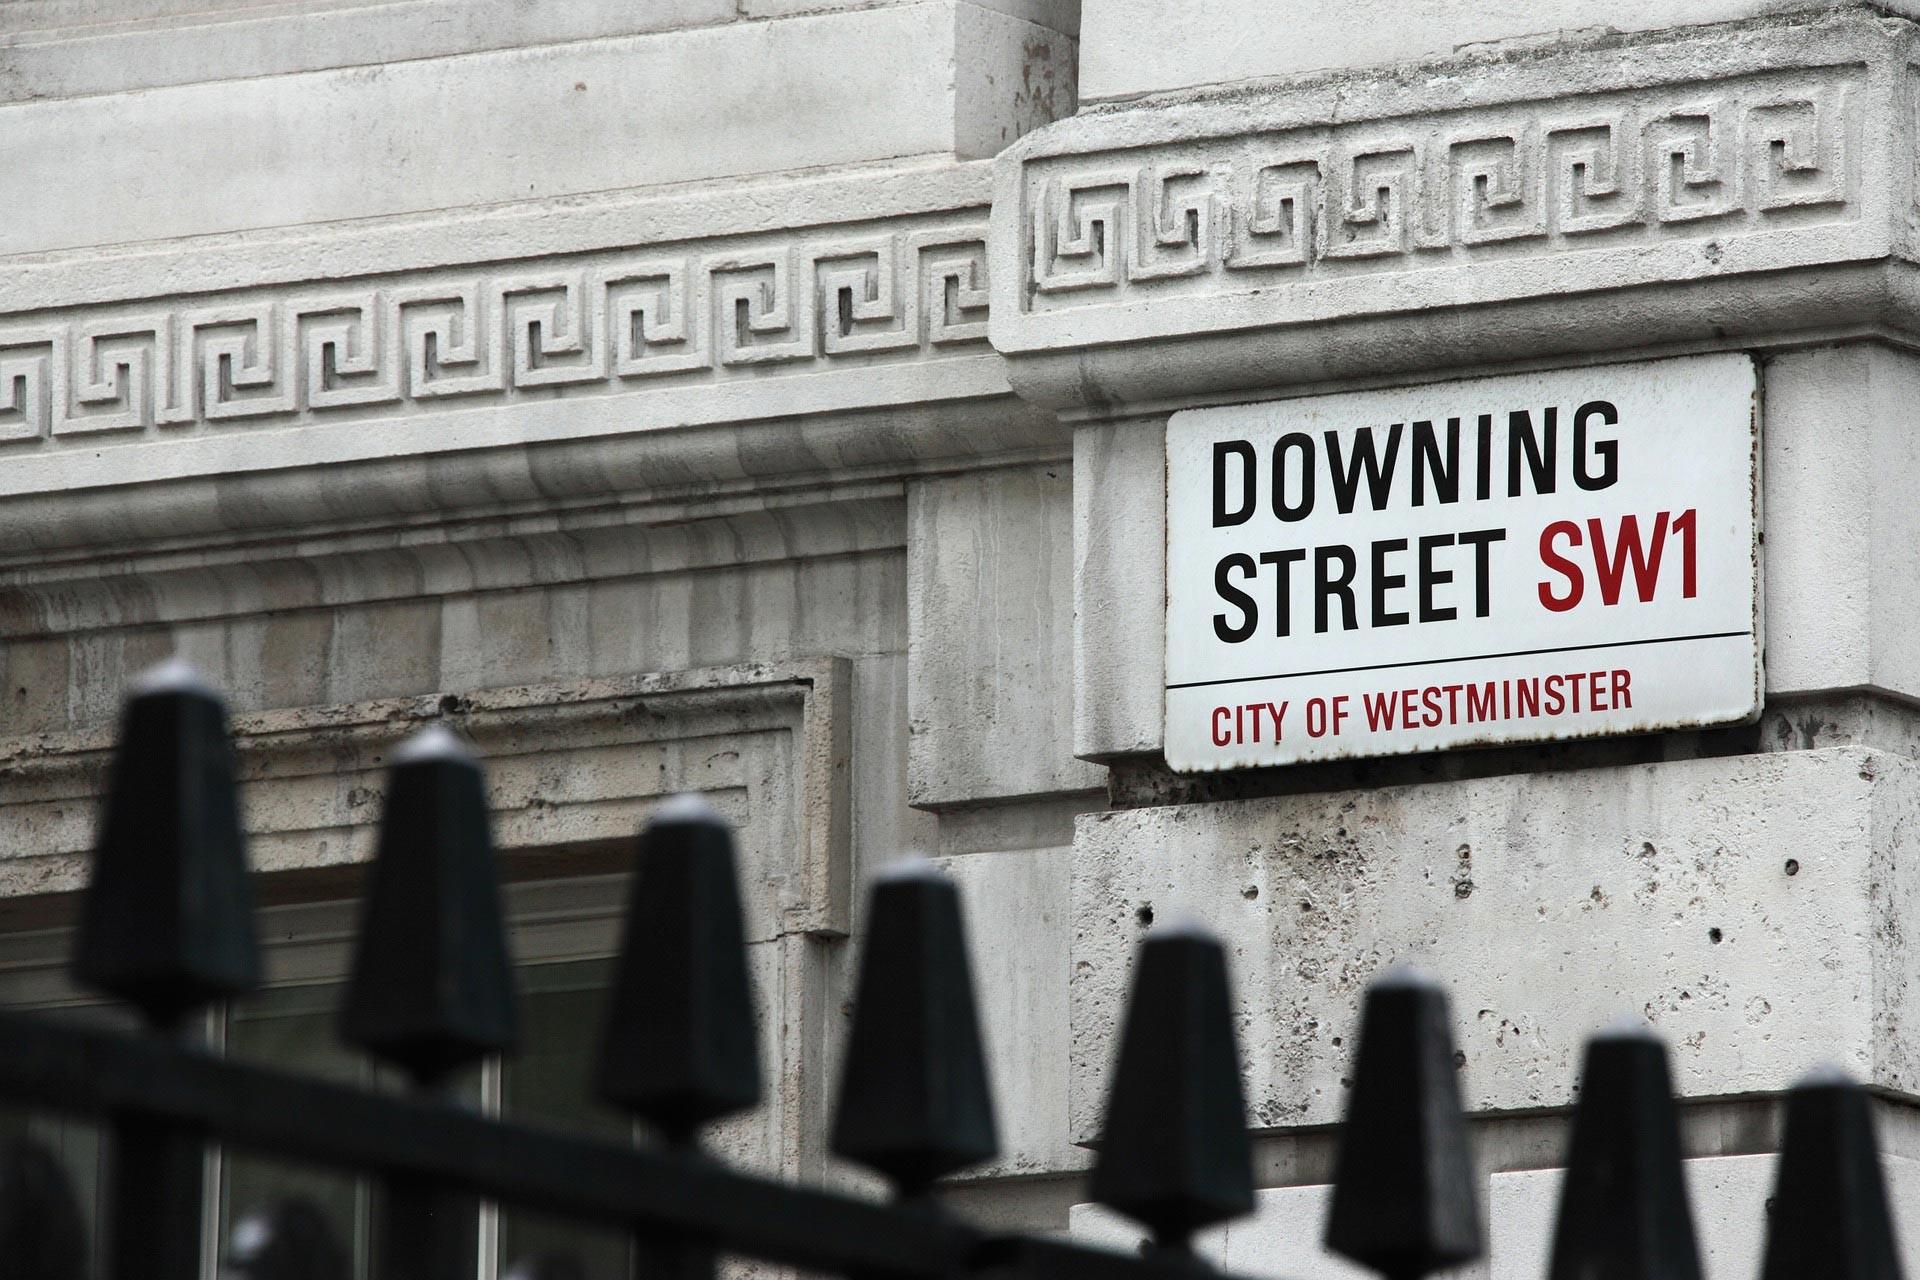 'Downing Street SW1- City of Westminister' yazılı tabela